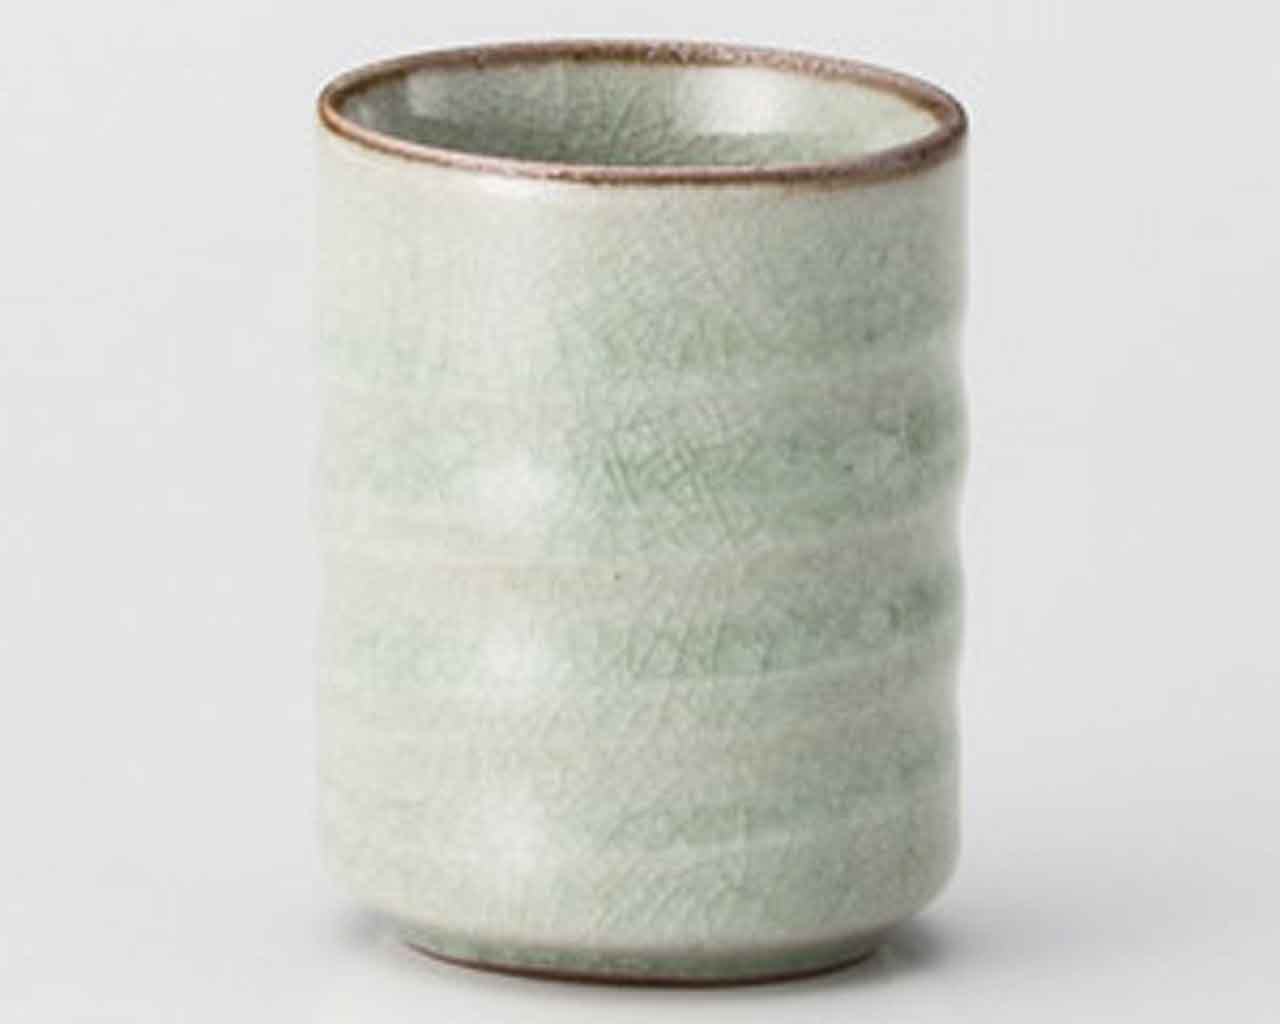 Kanyu 6cm Japanese Tea Cup Green Ceramic Made in Japan watou.asia